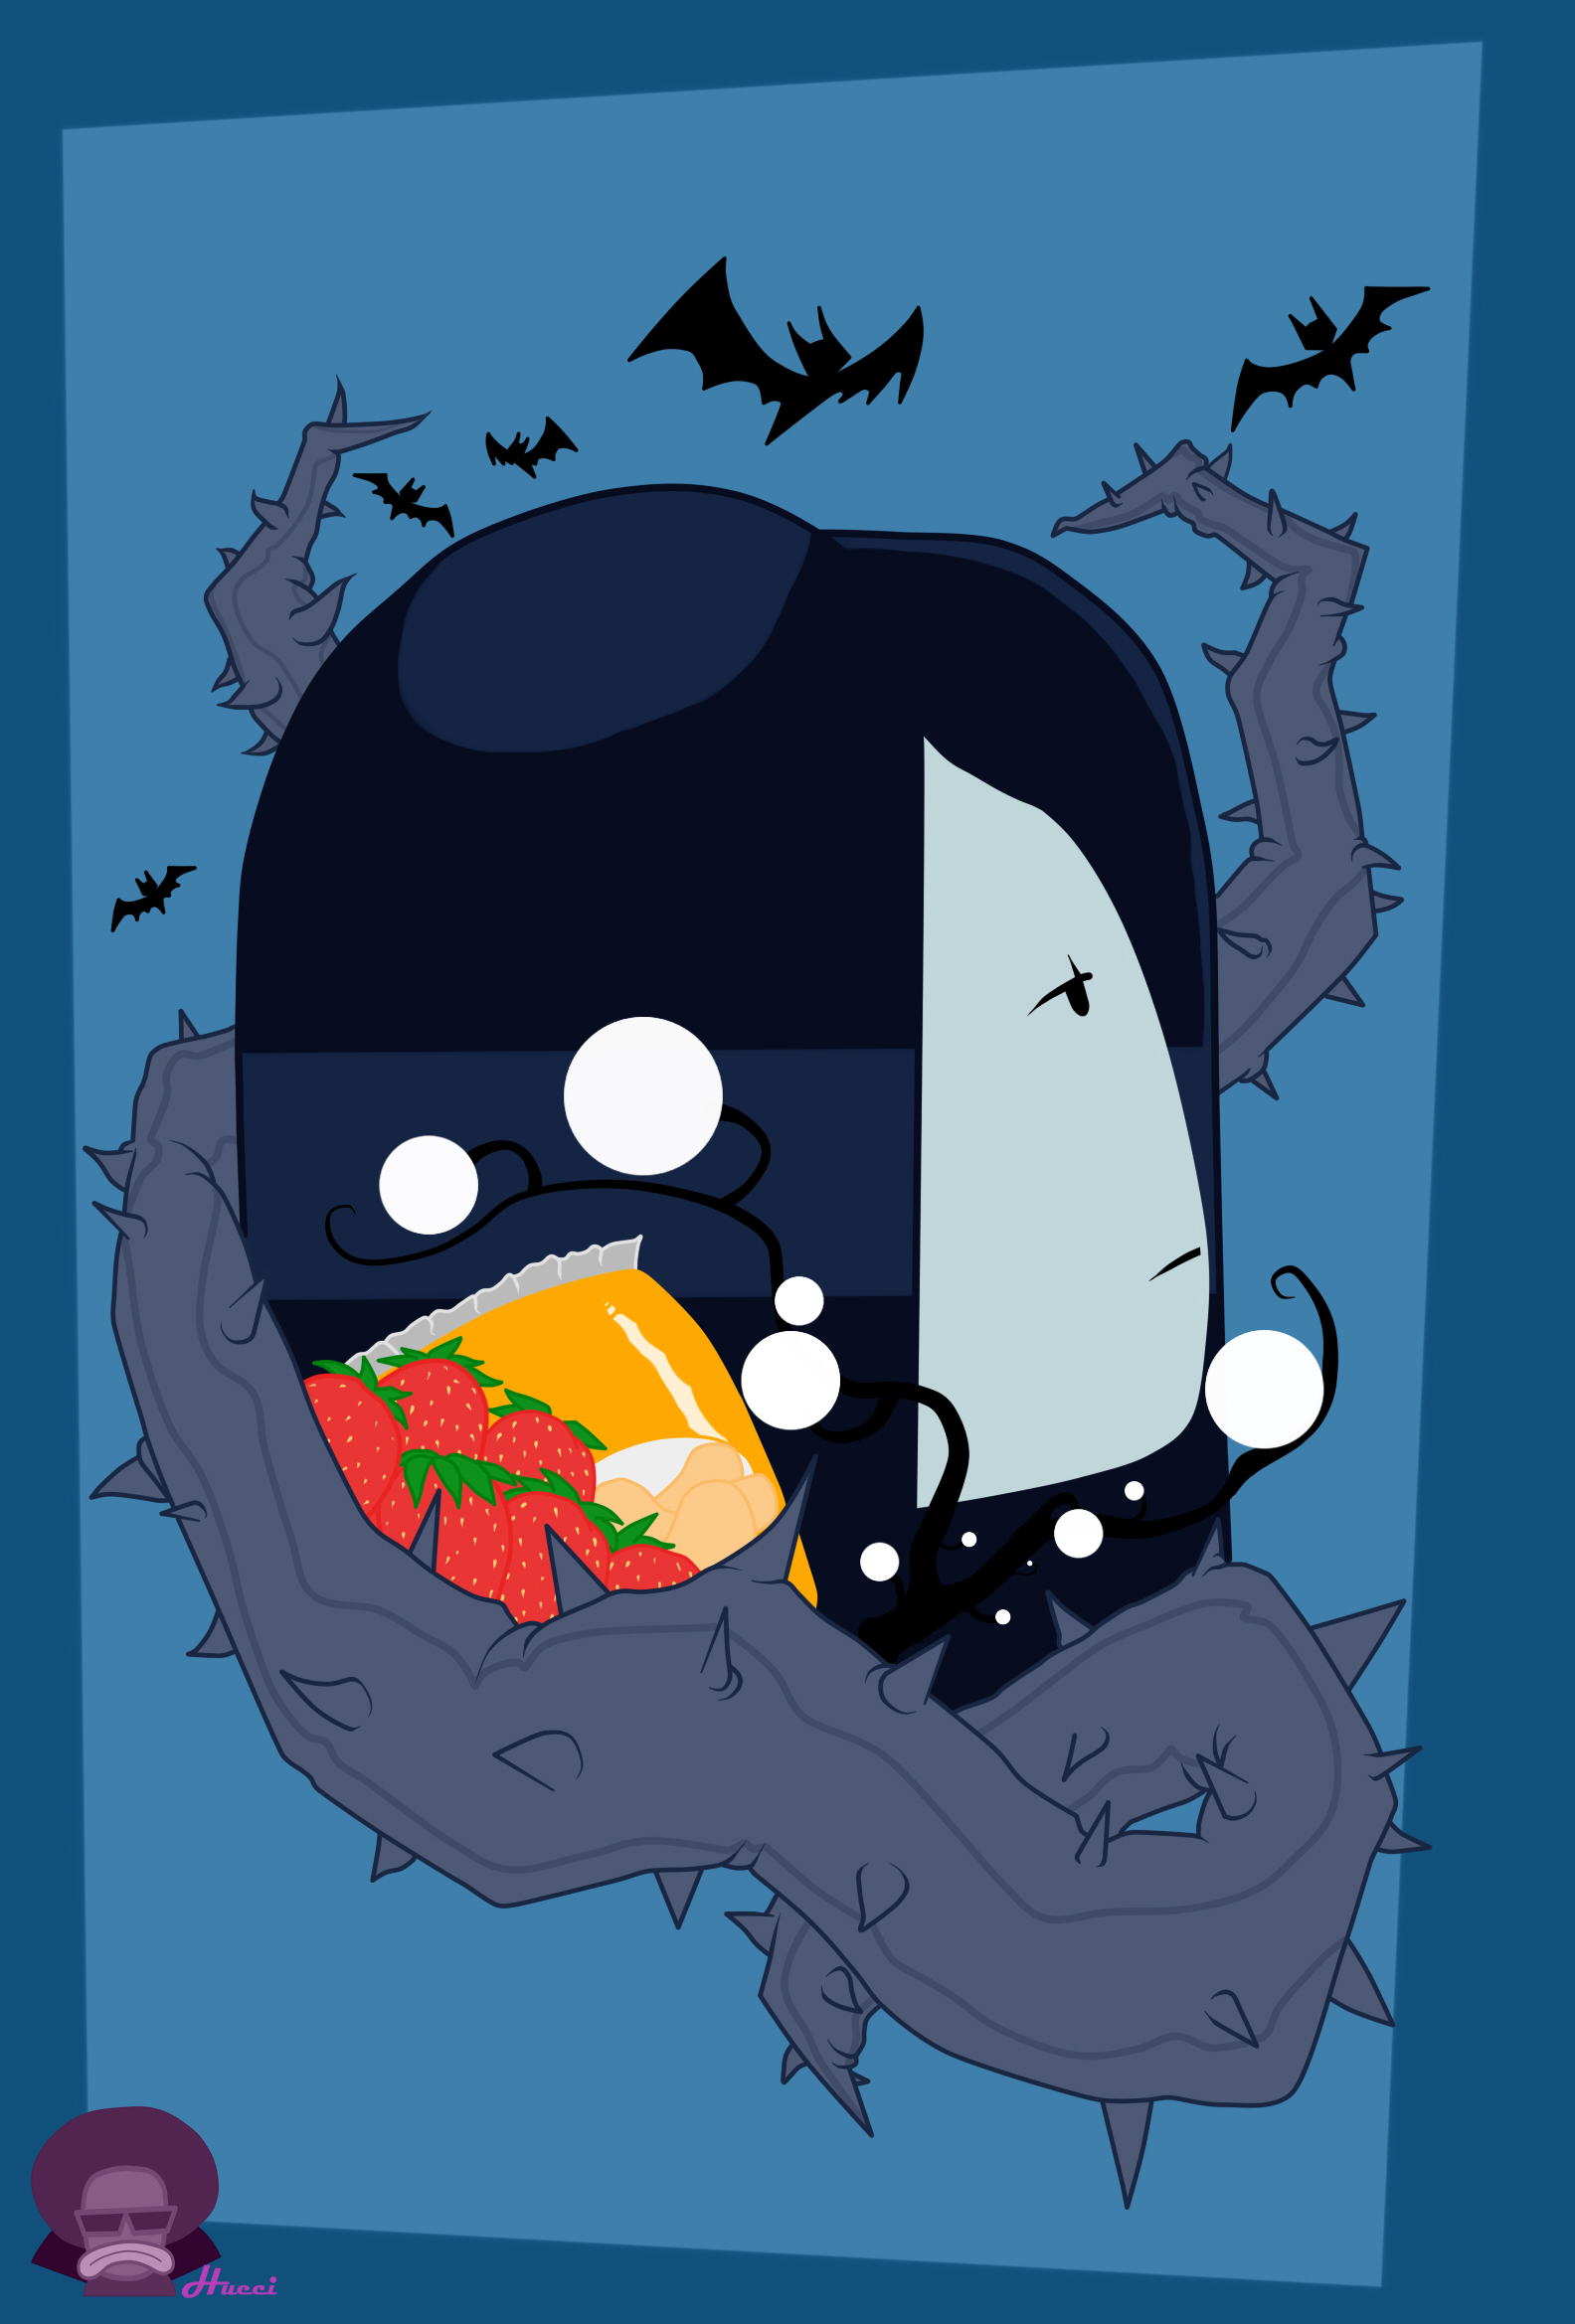 Marceline the Vampire Queen wallpaper by Hueci on Newgrounds 1584x2338